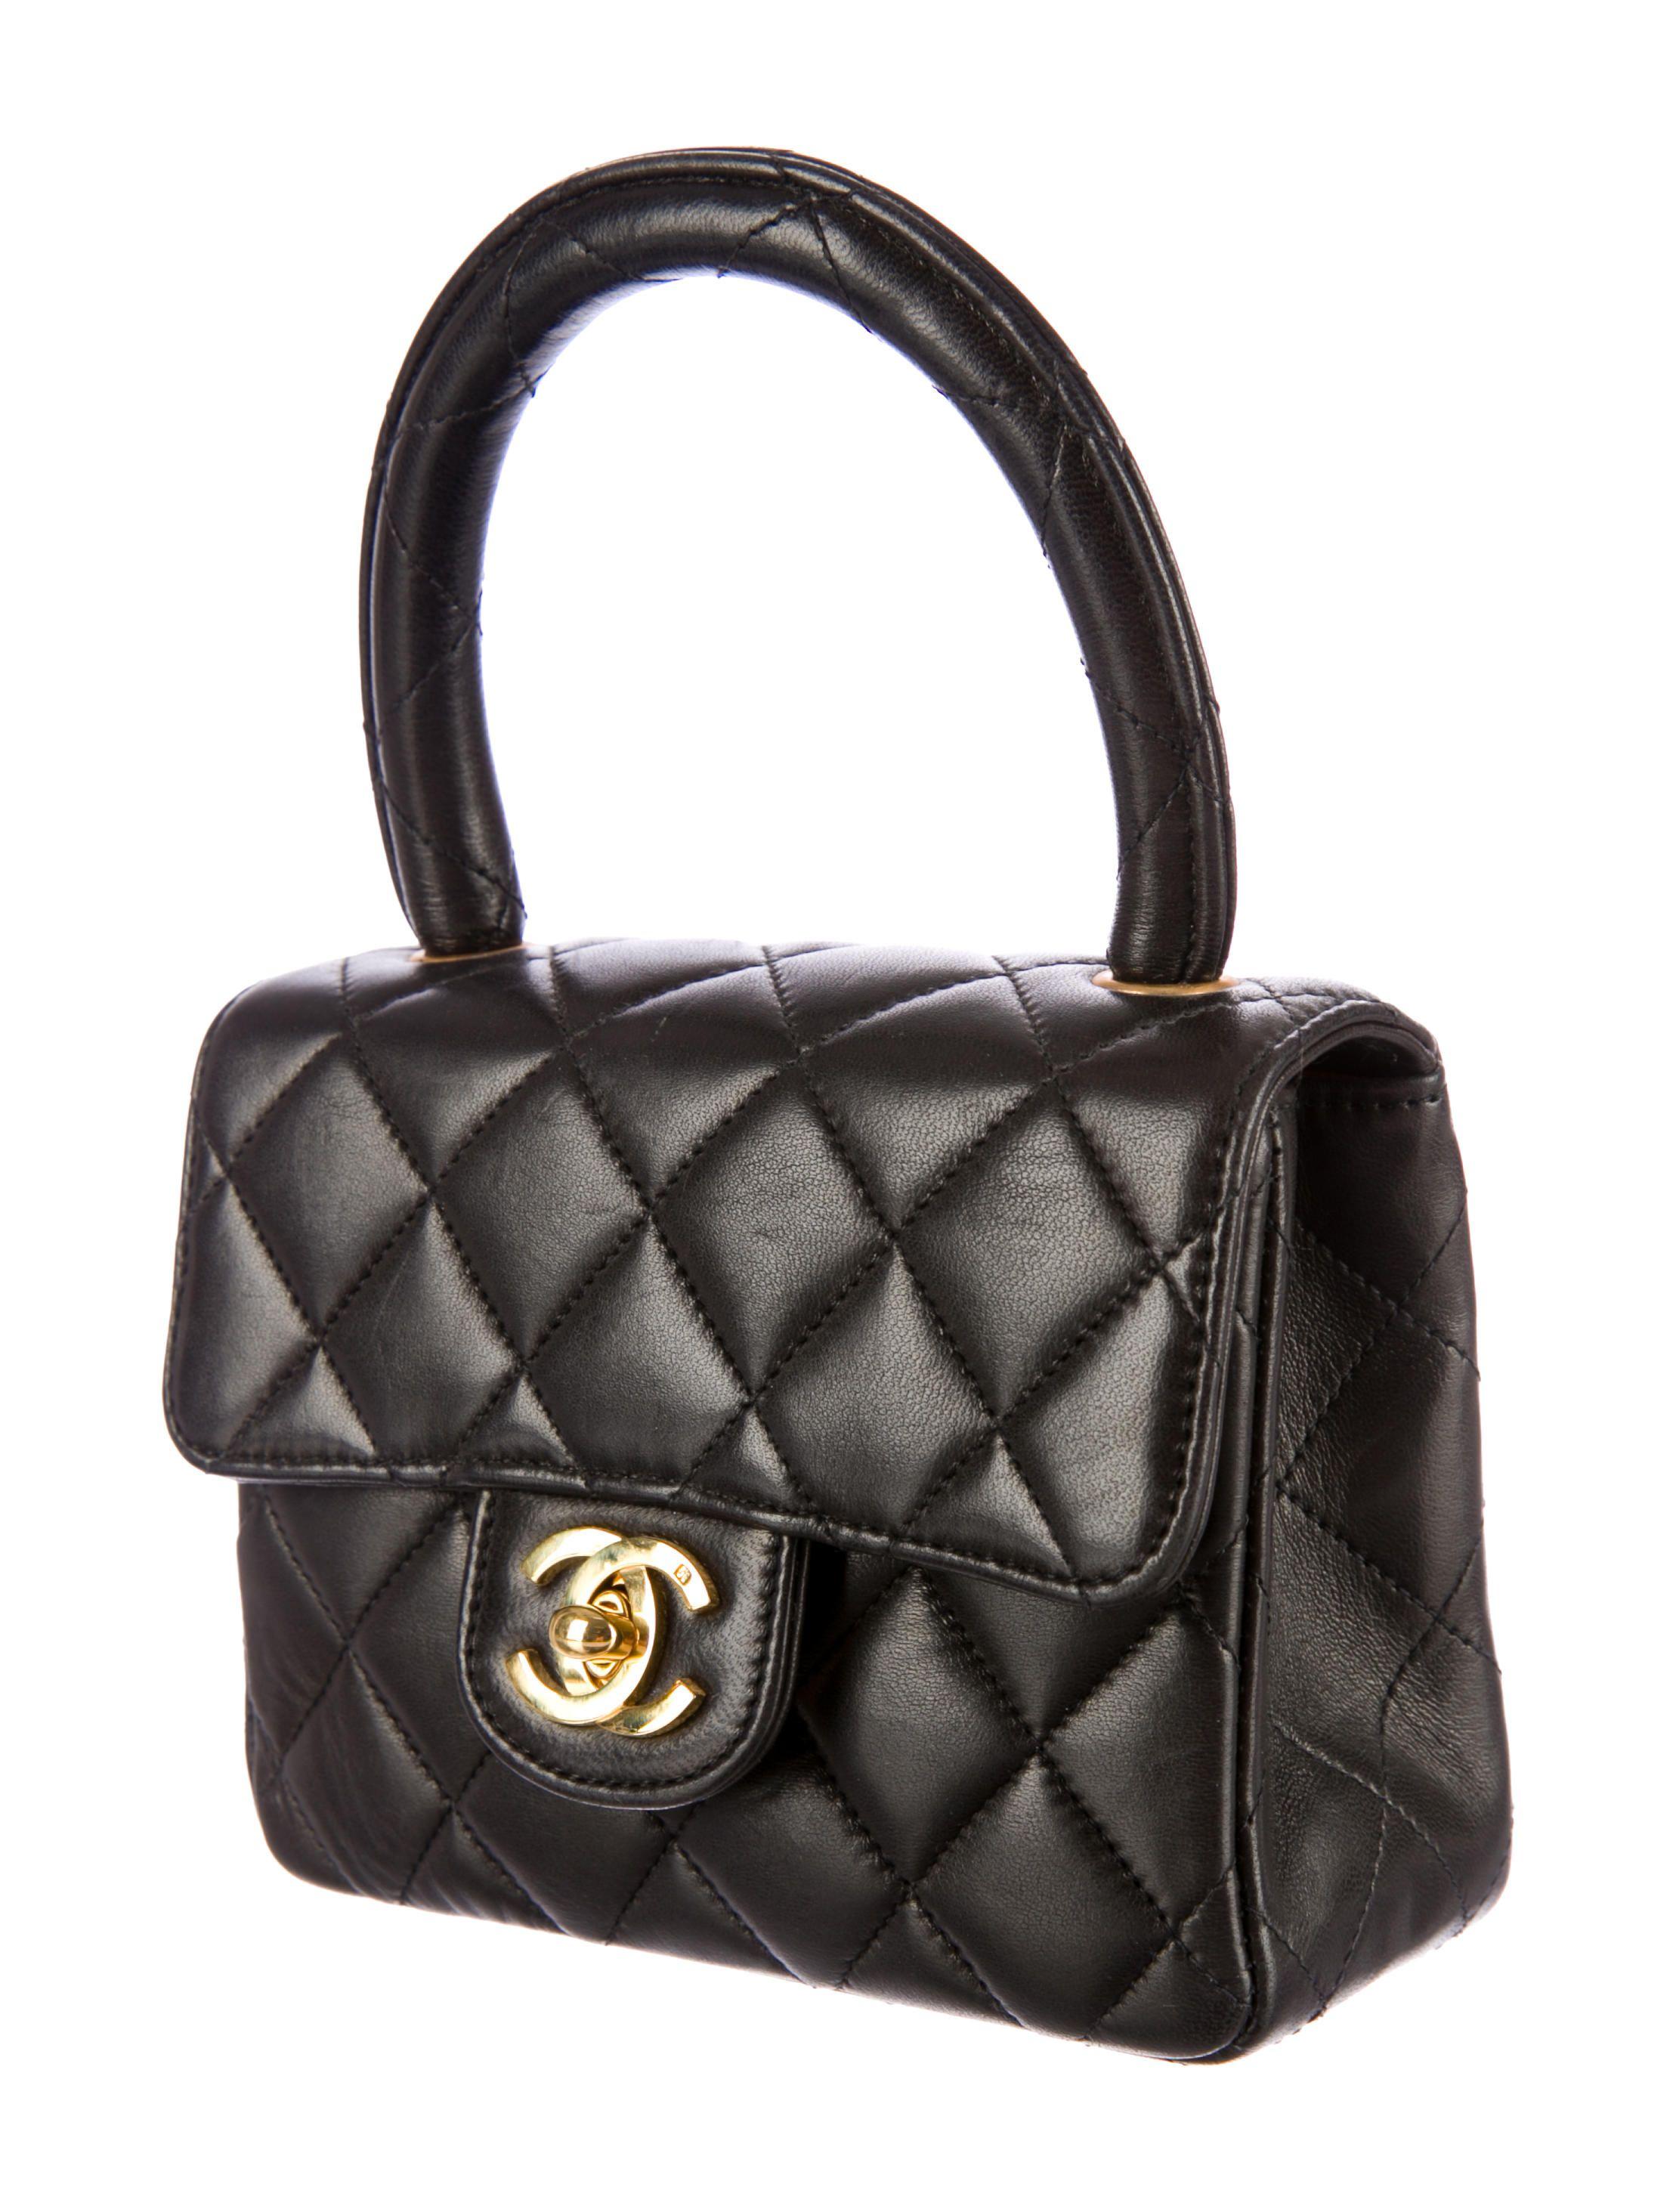 Chanel Mini Kelly Bag Vintage Chanel Bag Chanel Bag Chanel Handbags